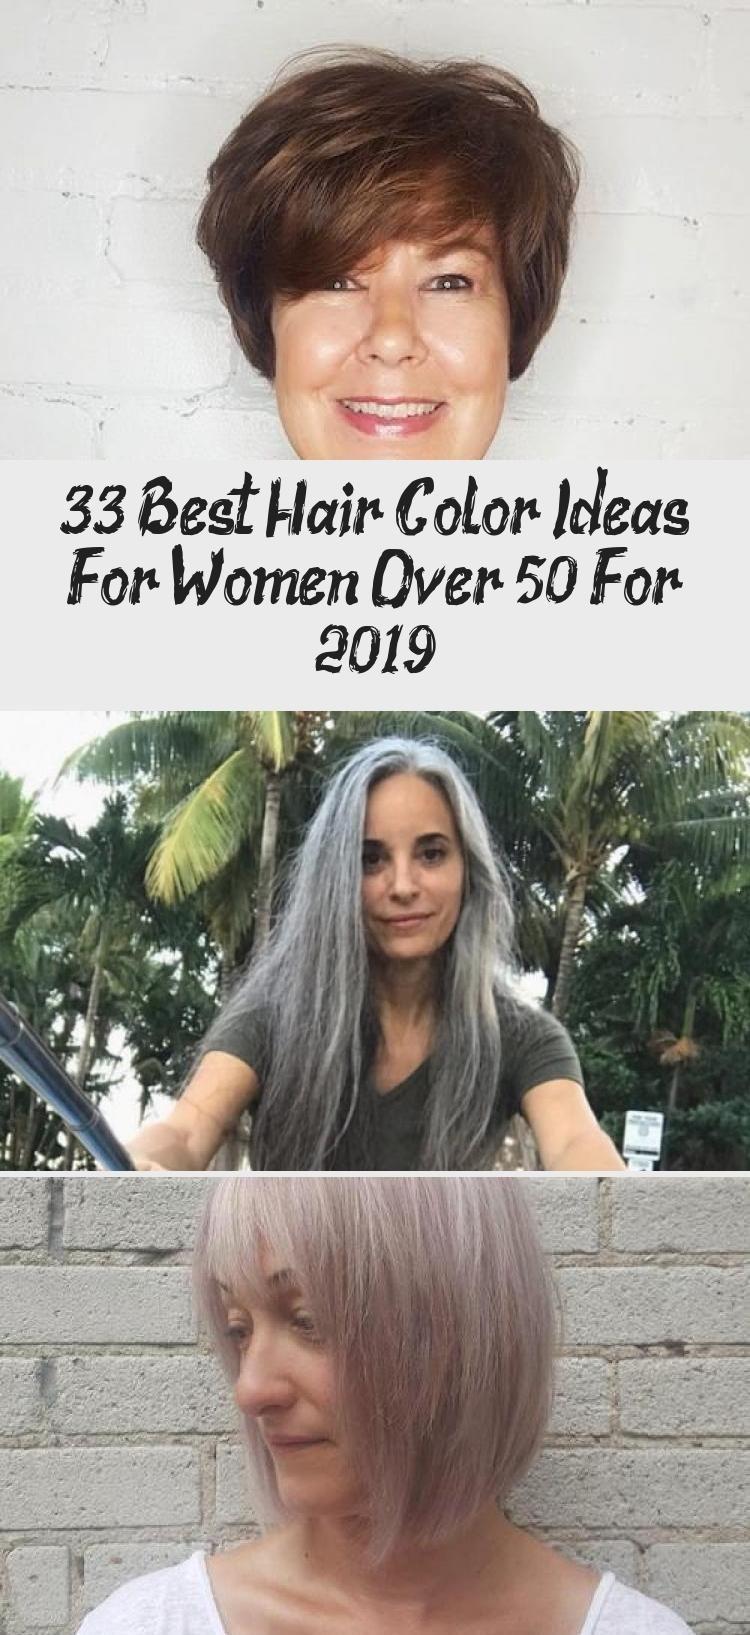 20 Best Hair Color Ideas for Women Over 20 in 20 grayhairDIY ...